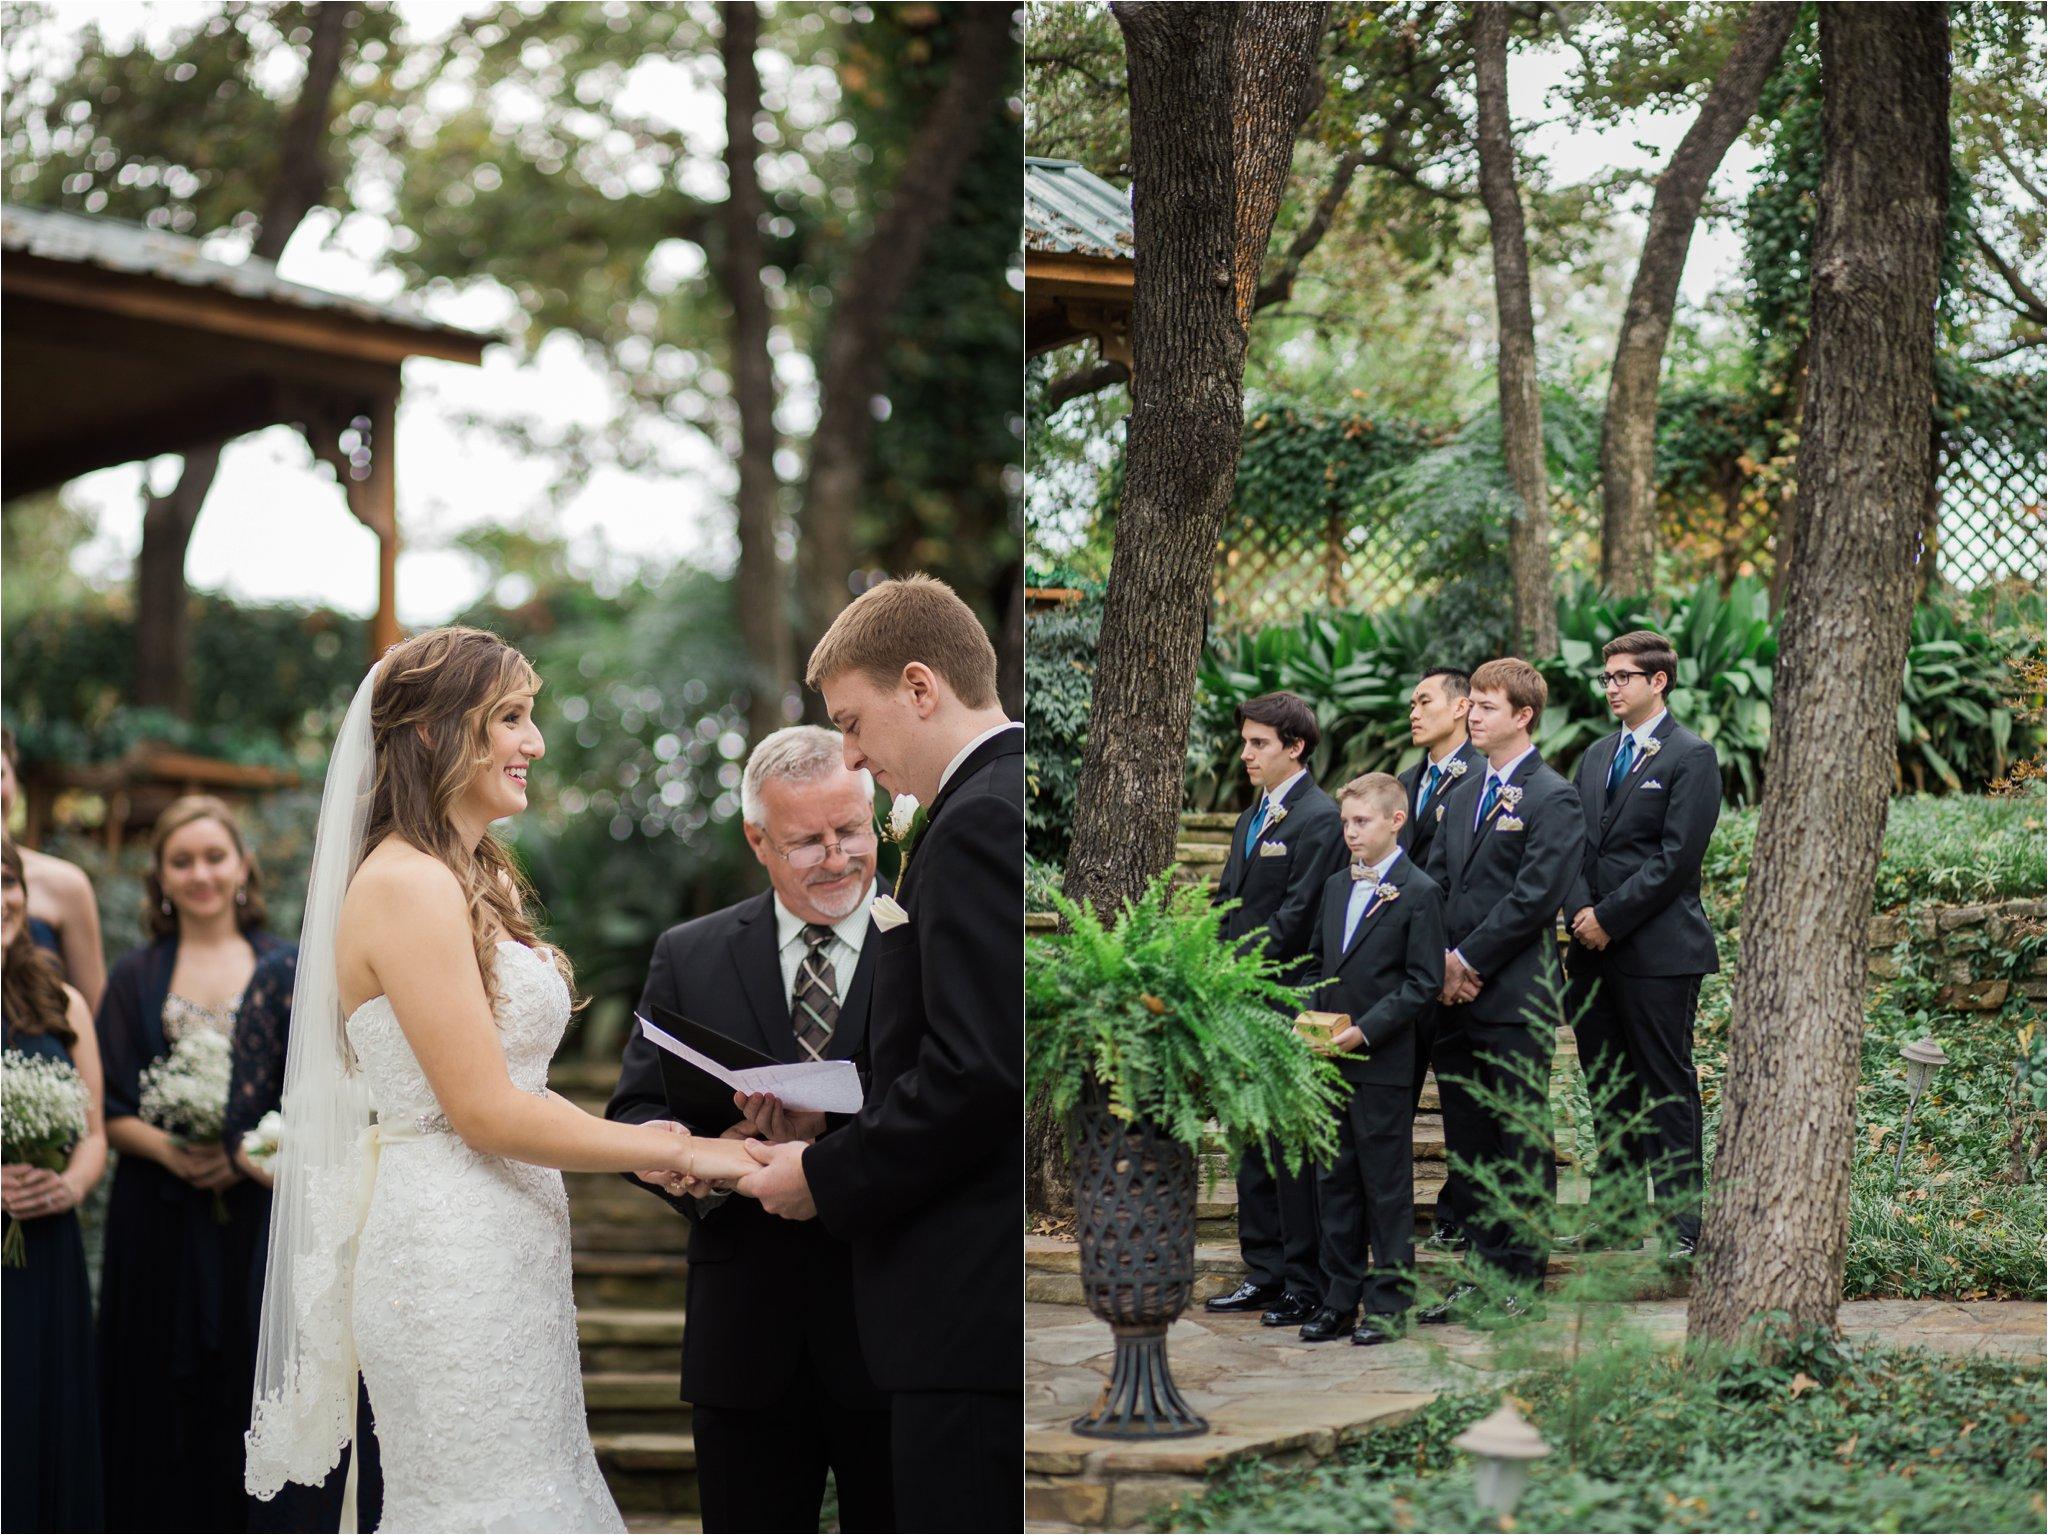 lunsford-wedding-575.jpg